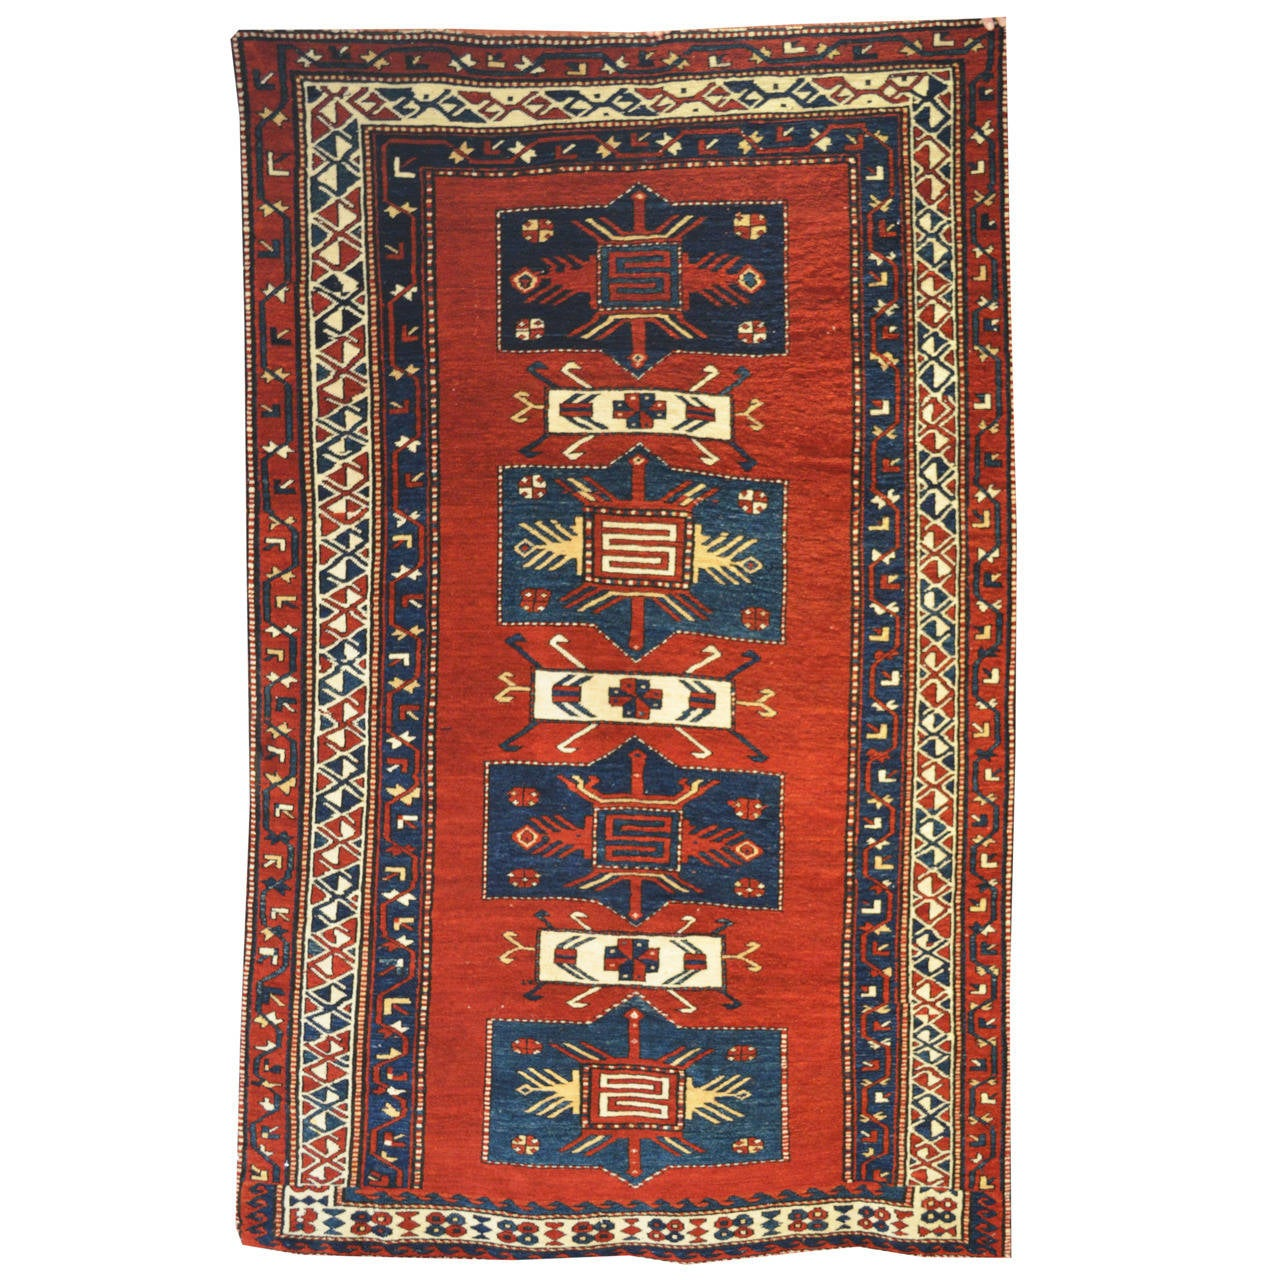 Breathtaking Large Geometric Red 10x12 Bakhtiari Persian: Antique Caucasian TOTEM Bordjalu-Kazak Carpet At 1stdibs